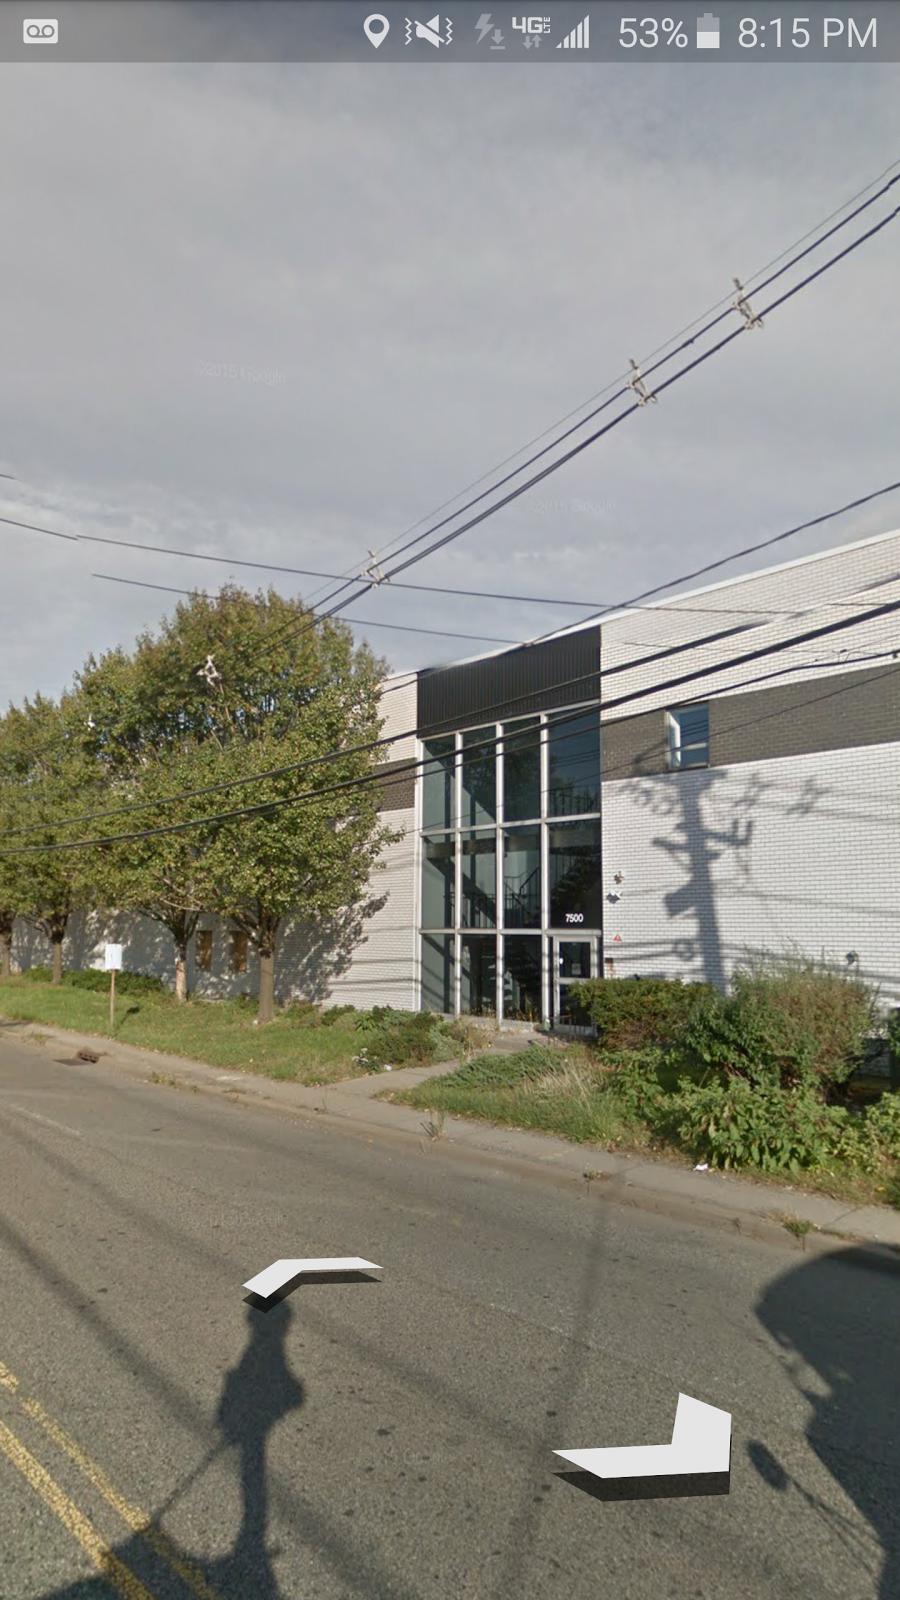 Bram Auto Group - storage  | Photo 3 of 7 | Address: 7500 West Side Ave, North Bergen, NJ 07047, USA | Phone: (201) 255-1200